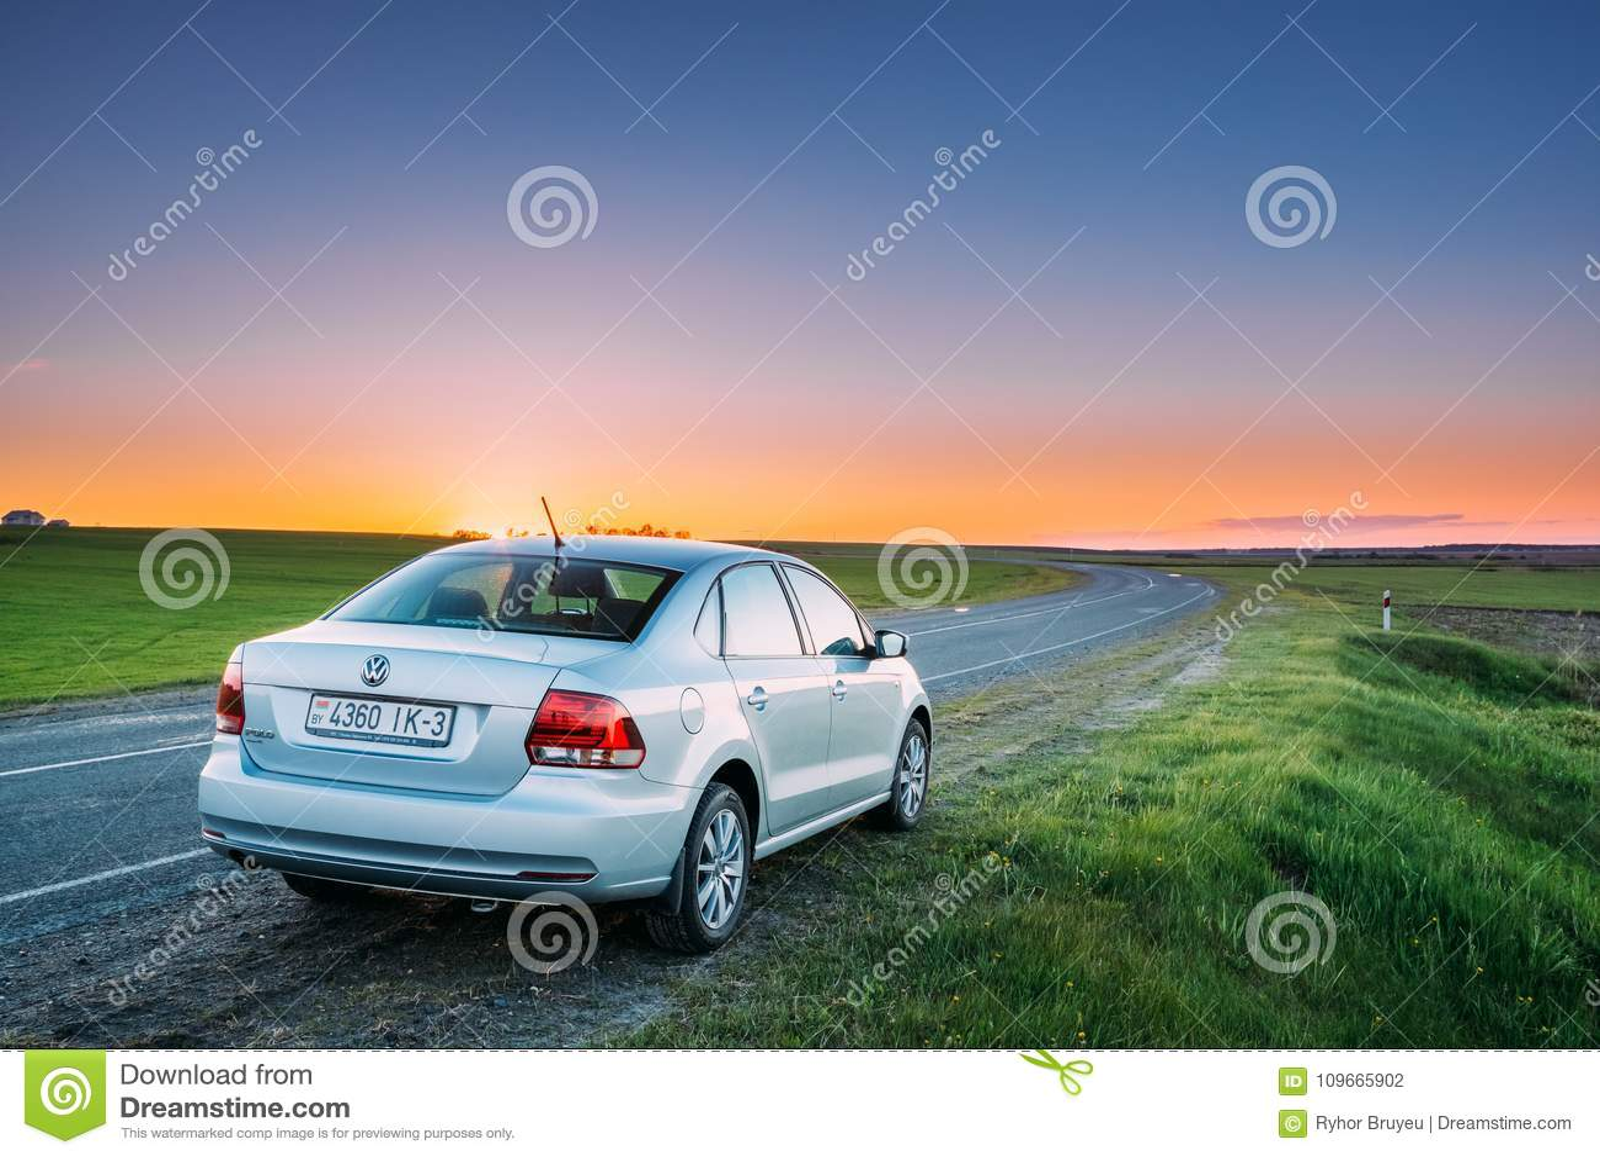 VW Volkswagen Polo Vento Sedan Car Parking nära Asphalt Country